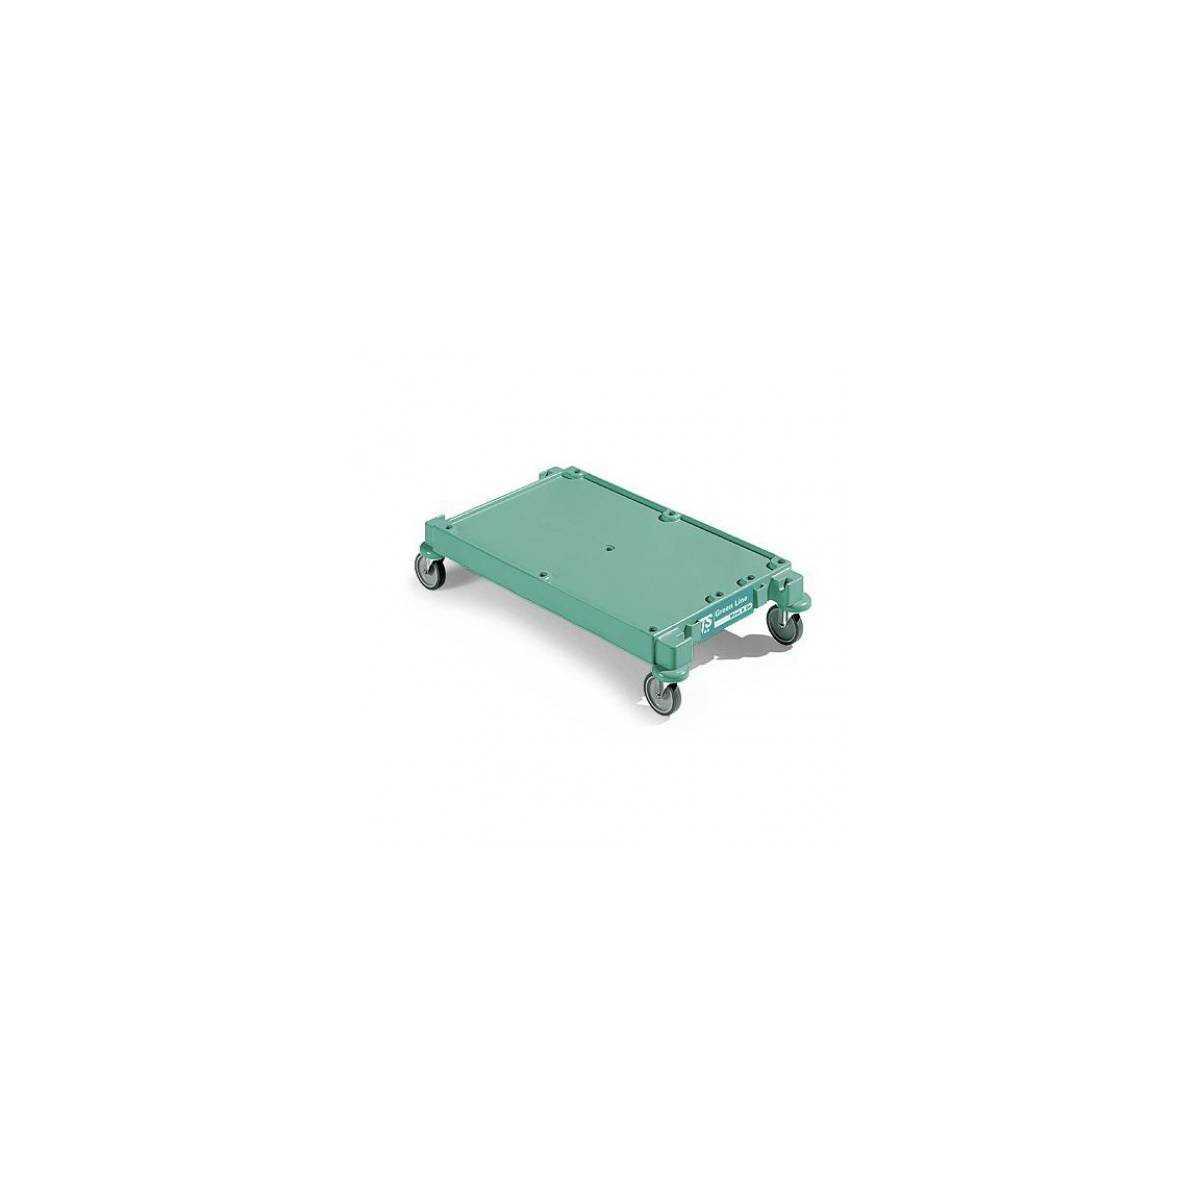 Малая база с колесами для тележек GreenLine (T091302) T091302 TTS